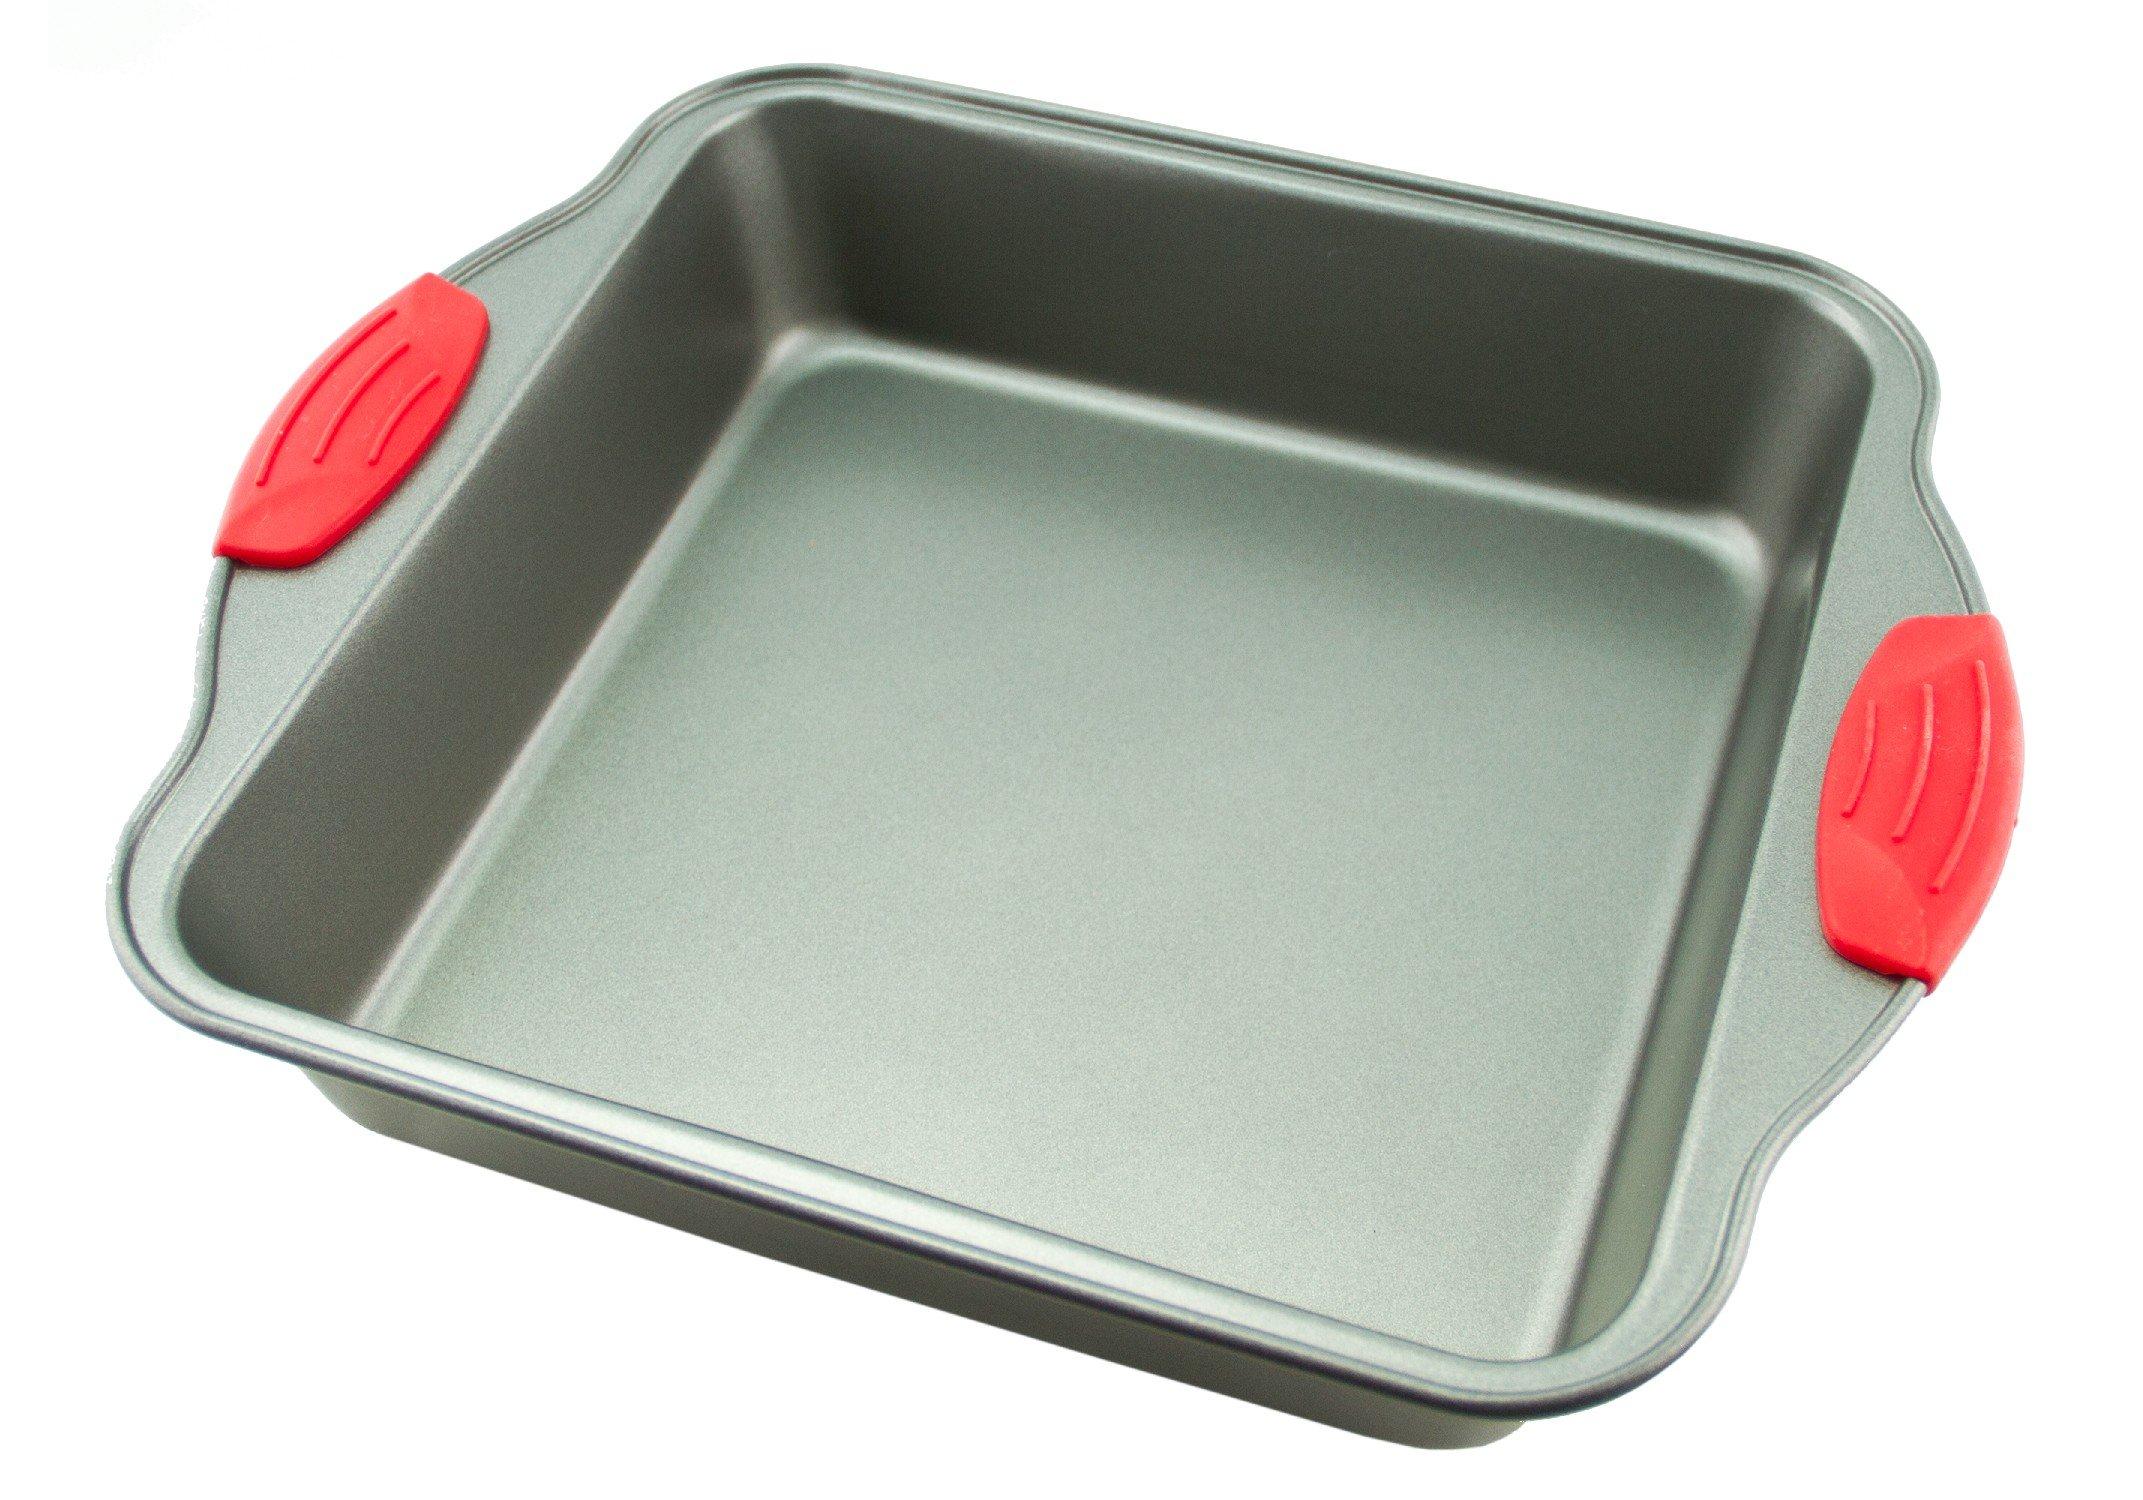 Cake Pan   Non-Stick Steel 8-Inch Square Baking Pan by Boxiki Kitchen   Durable, Convenient, Premium Quality No-Stick Baking Mold Cookware   Brownie Pan 8'' x 8'' x 2'' by Boxiki Kitchen